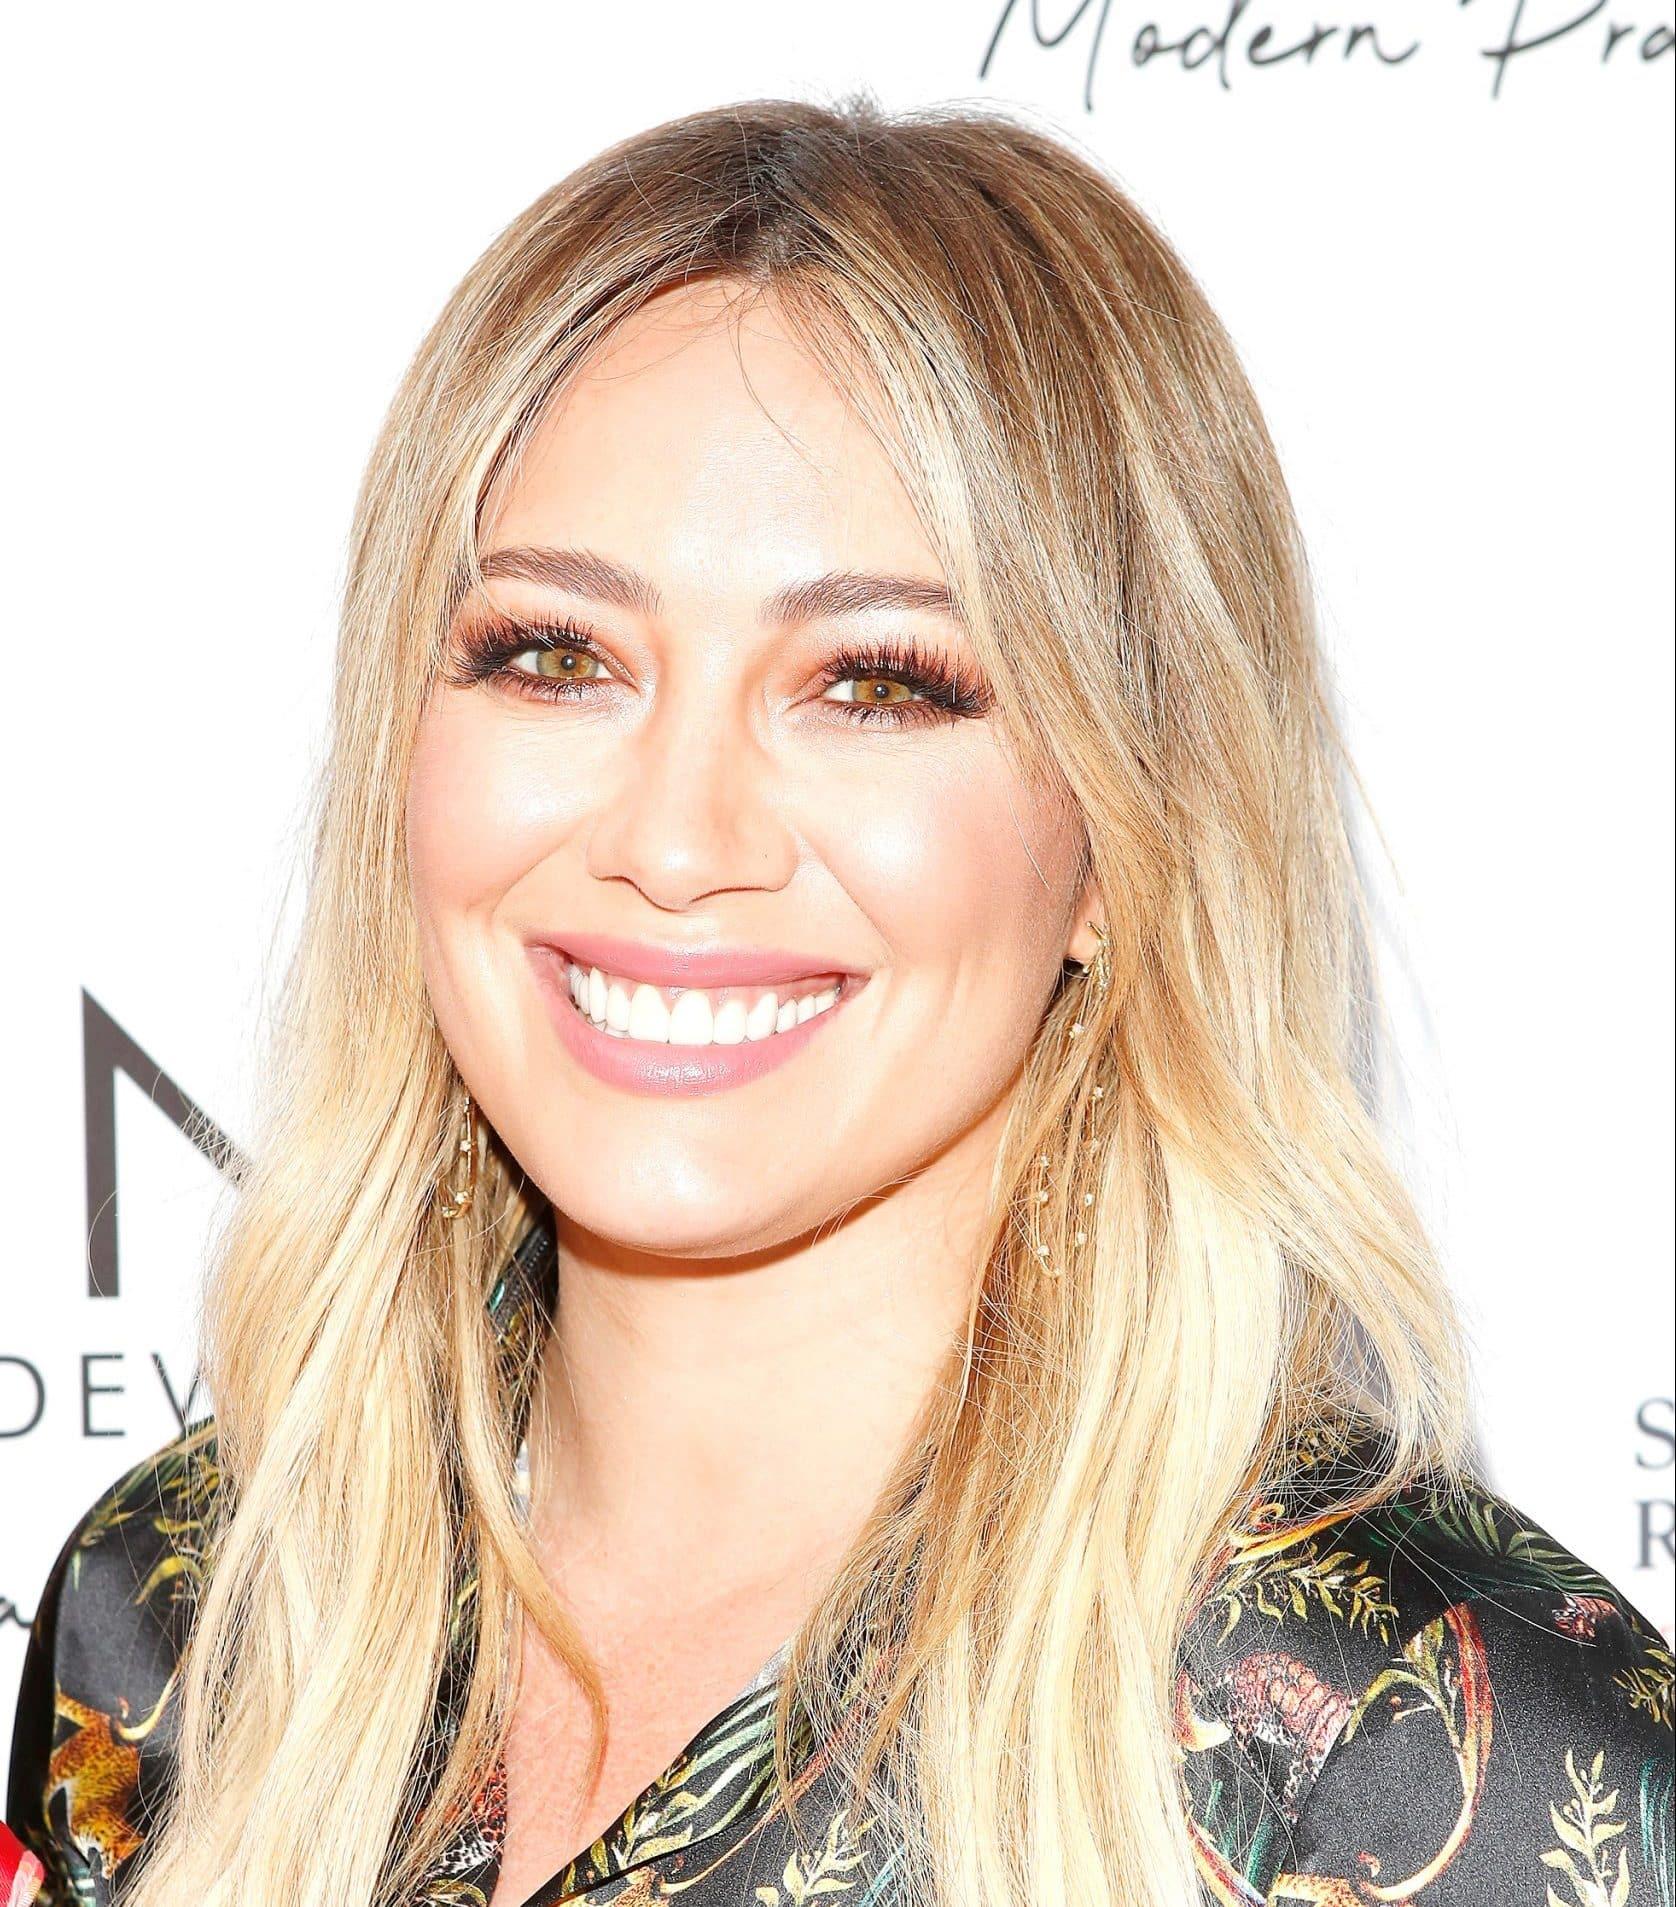 Hilary Duff (Photo: Joe Seer/Shutterstock.com)